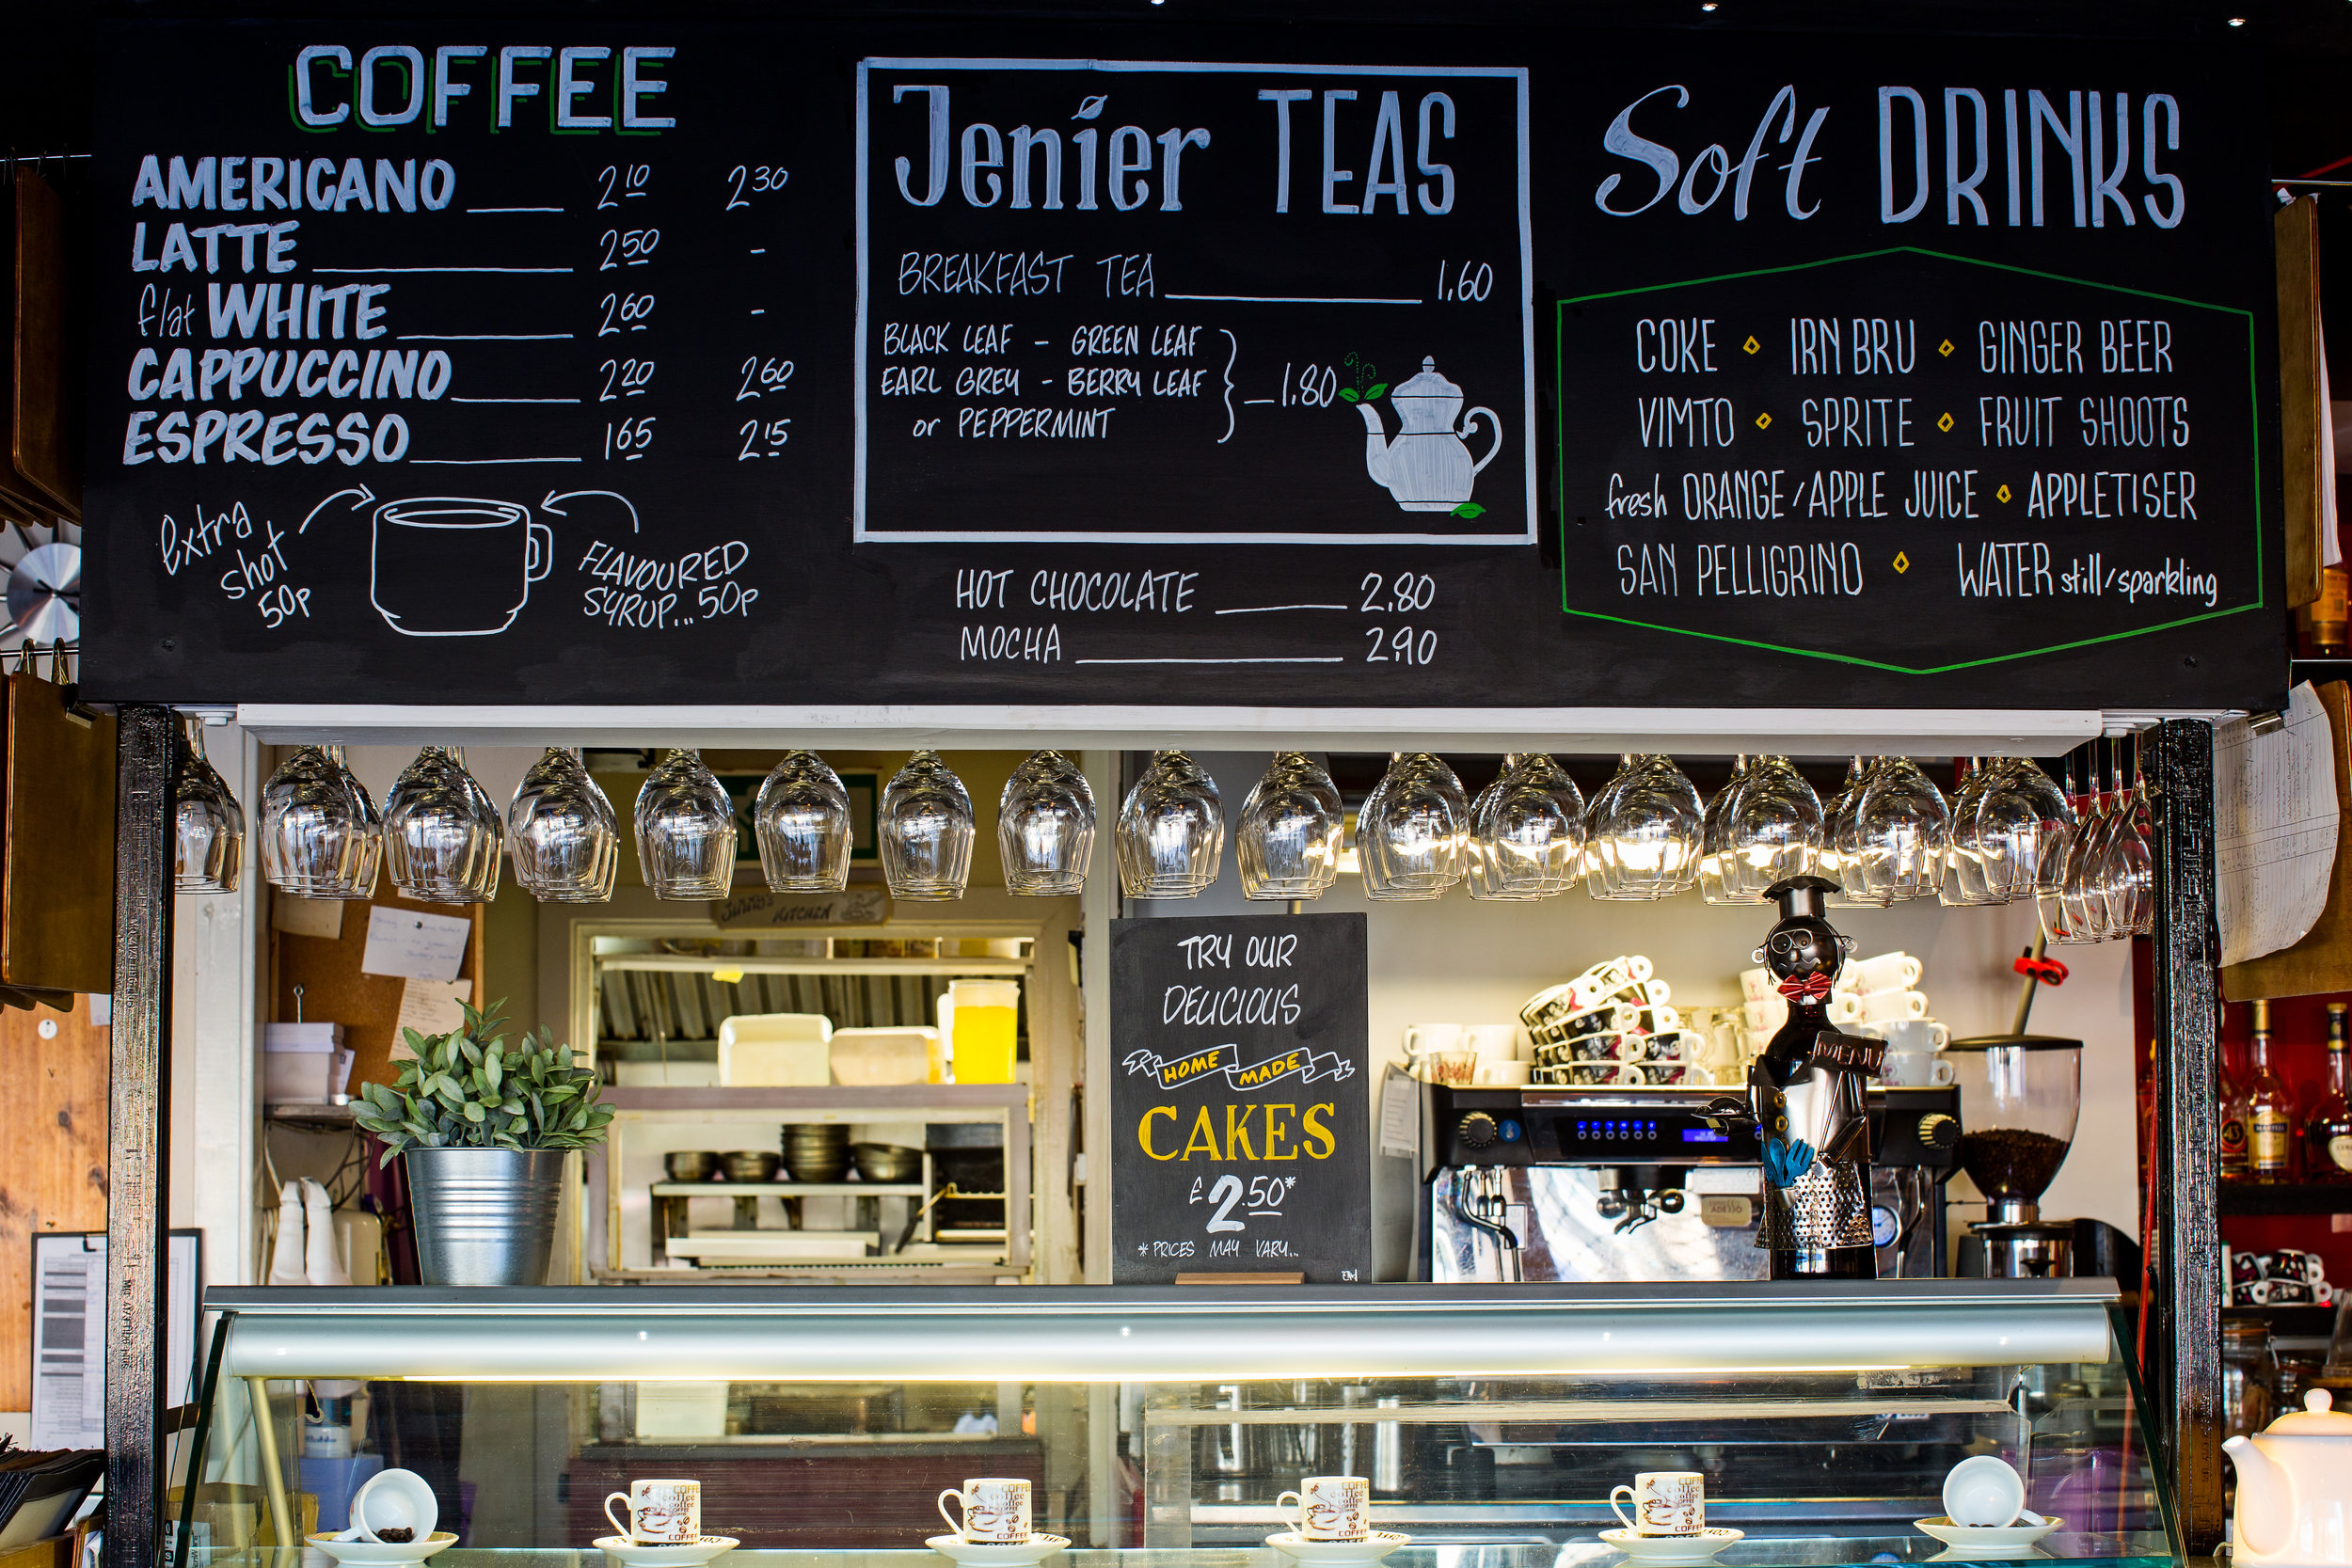 papamacs-gourmet-kitchen-chalkboard-marketing-maverick-designs-glasgow-johnstone-renfrewshire.jpg